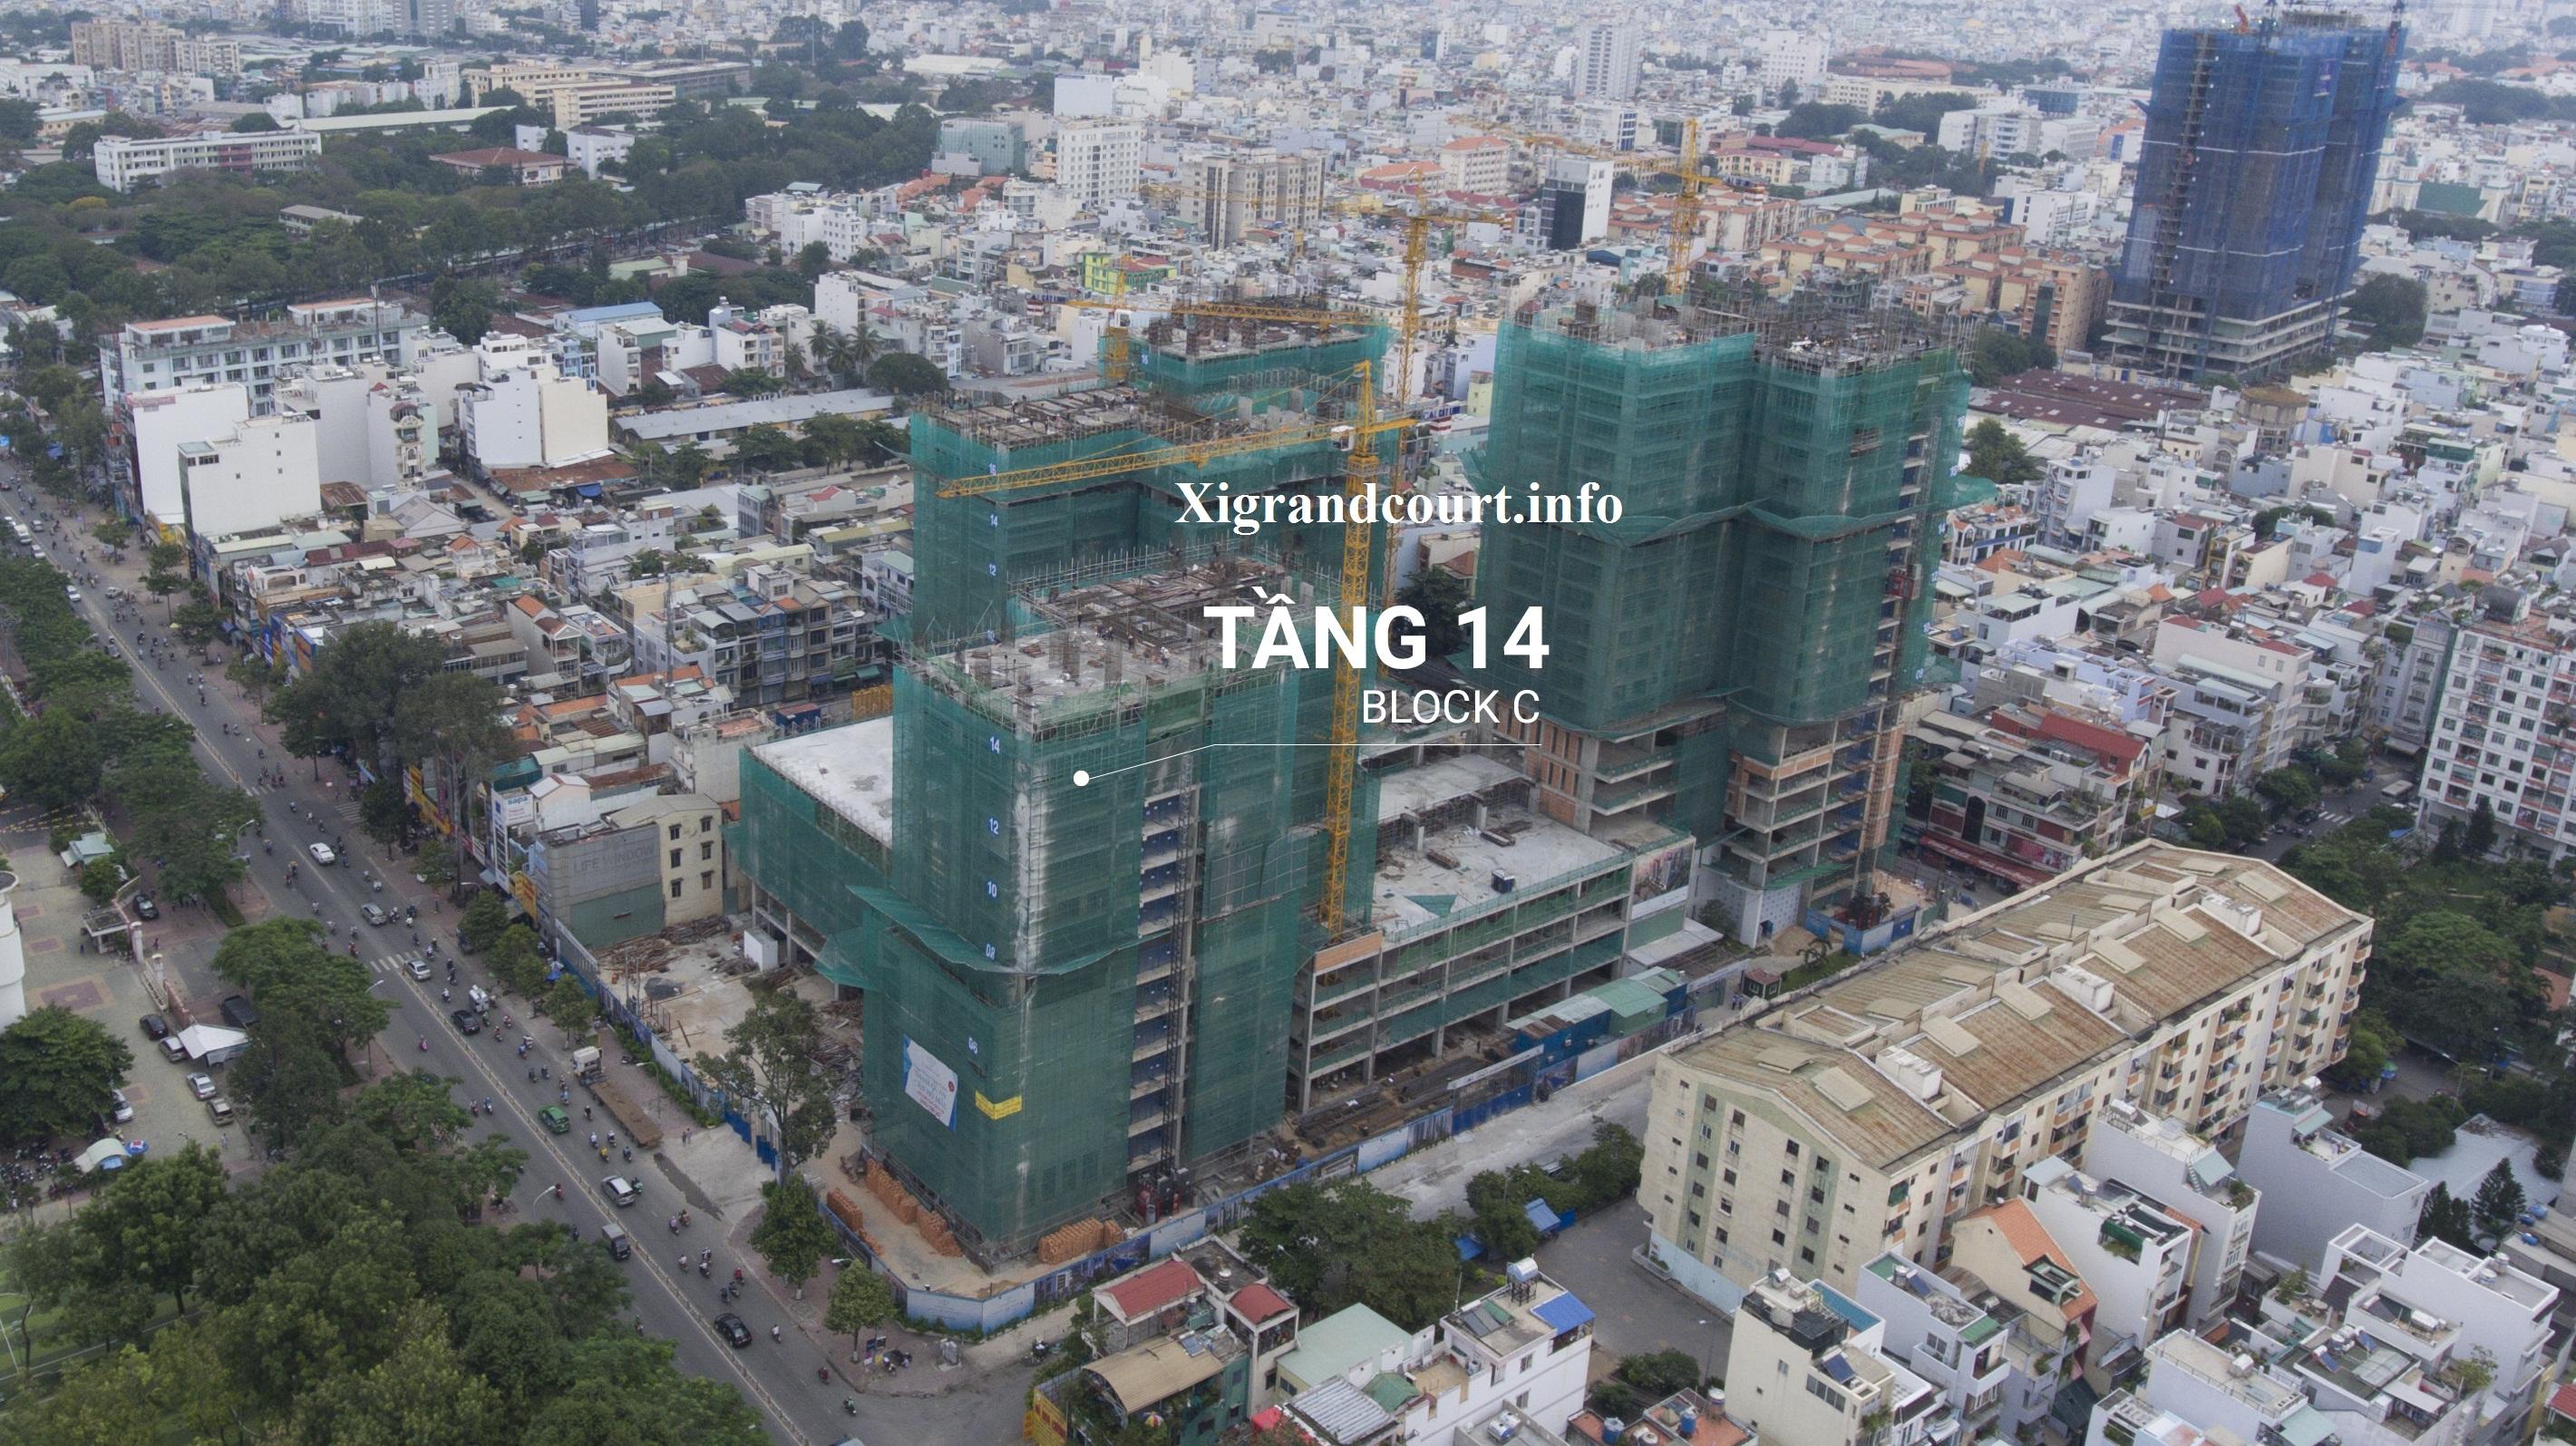 https://cdn.realtorvietnam.com/uploads/real_estate/block-c-xi-grand-court-quan-10_1490152212.jpg